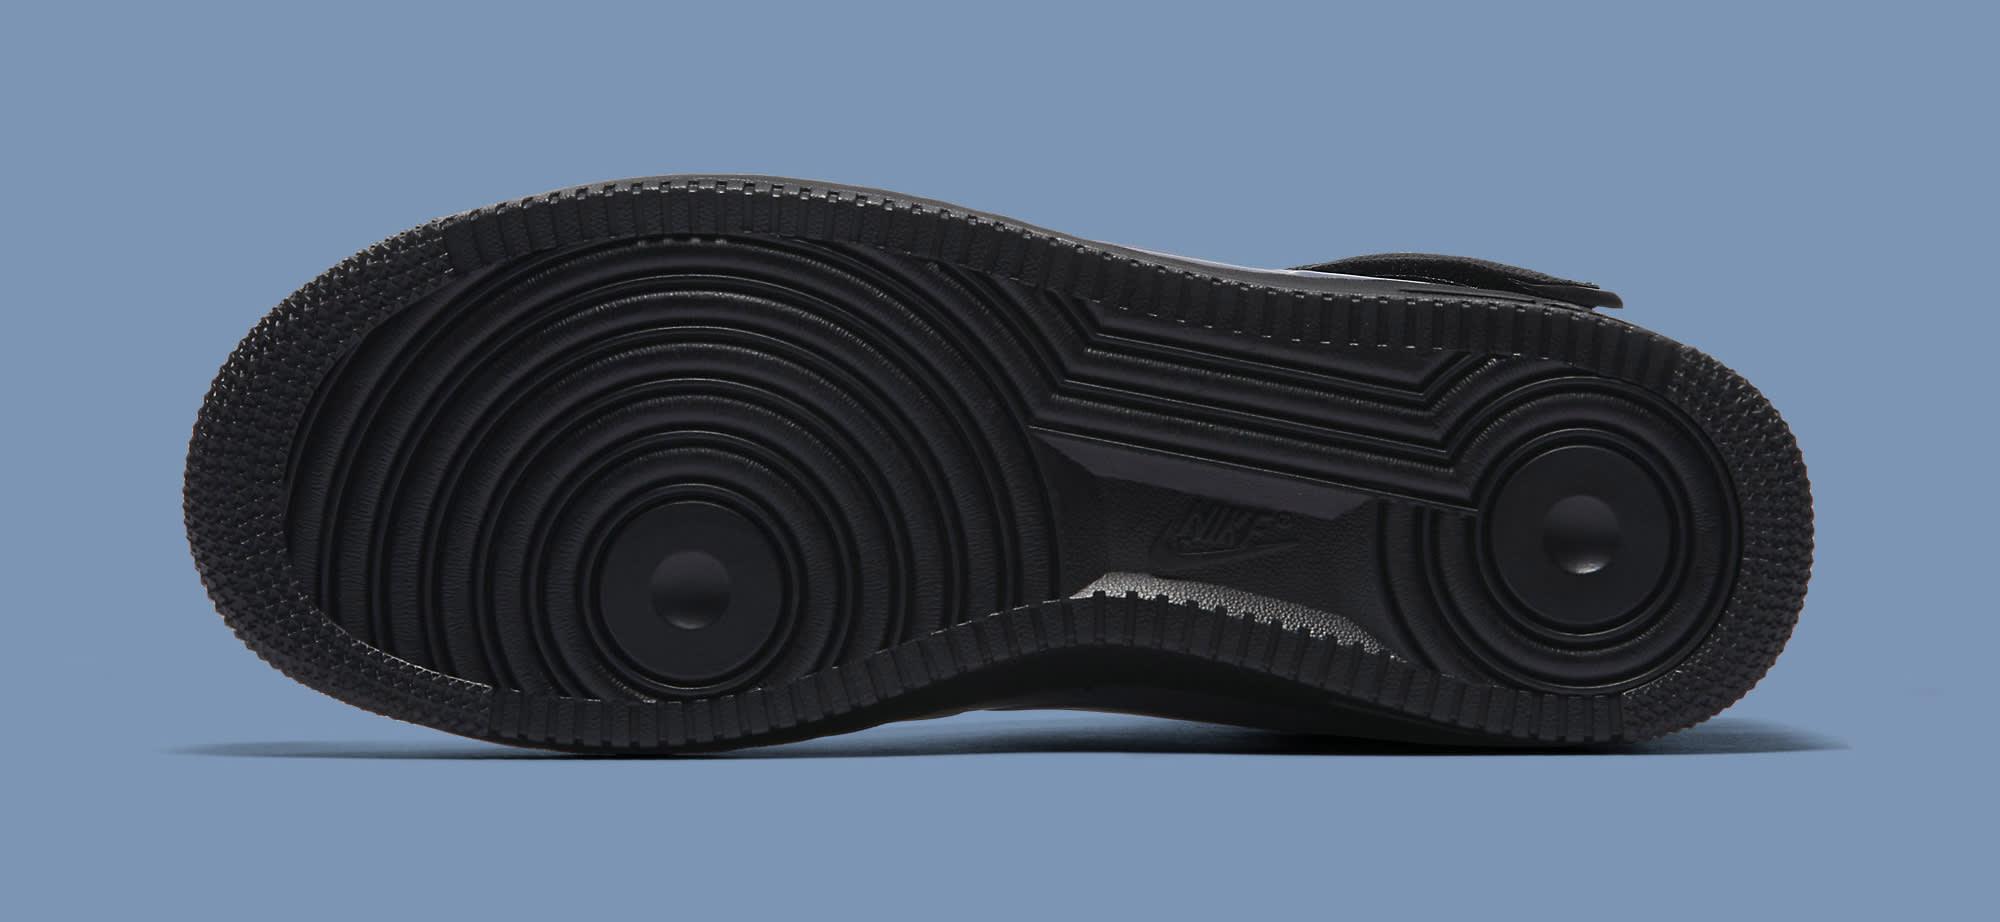 Nike Air Force 1 Foamposite Light Carbon AH6771-002 Sole